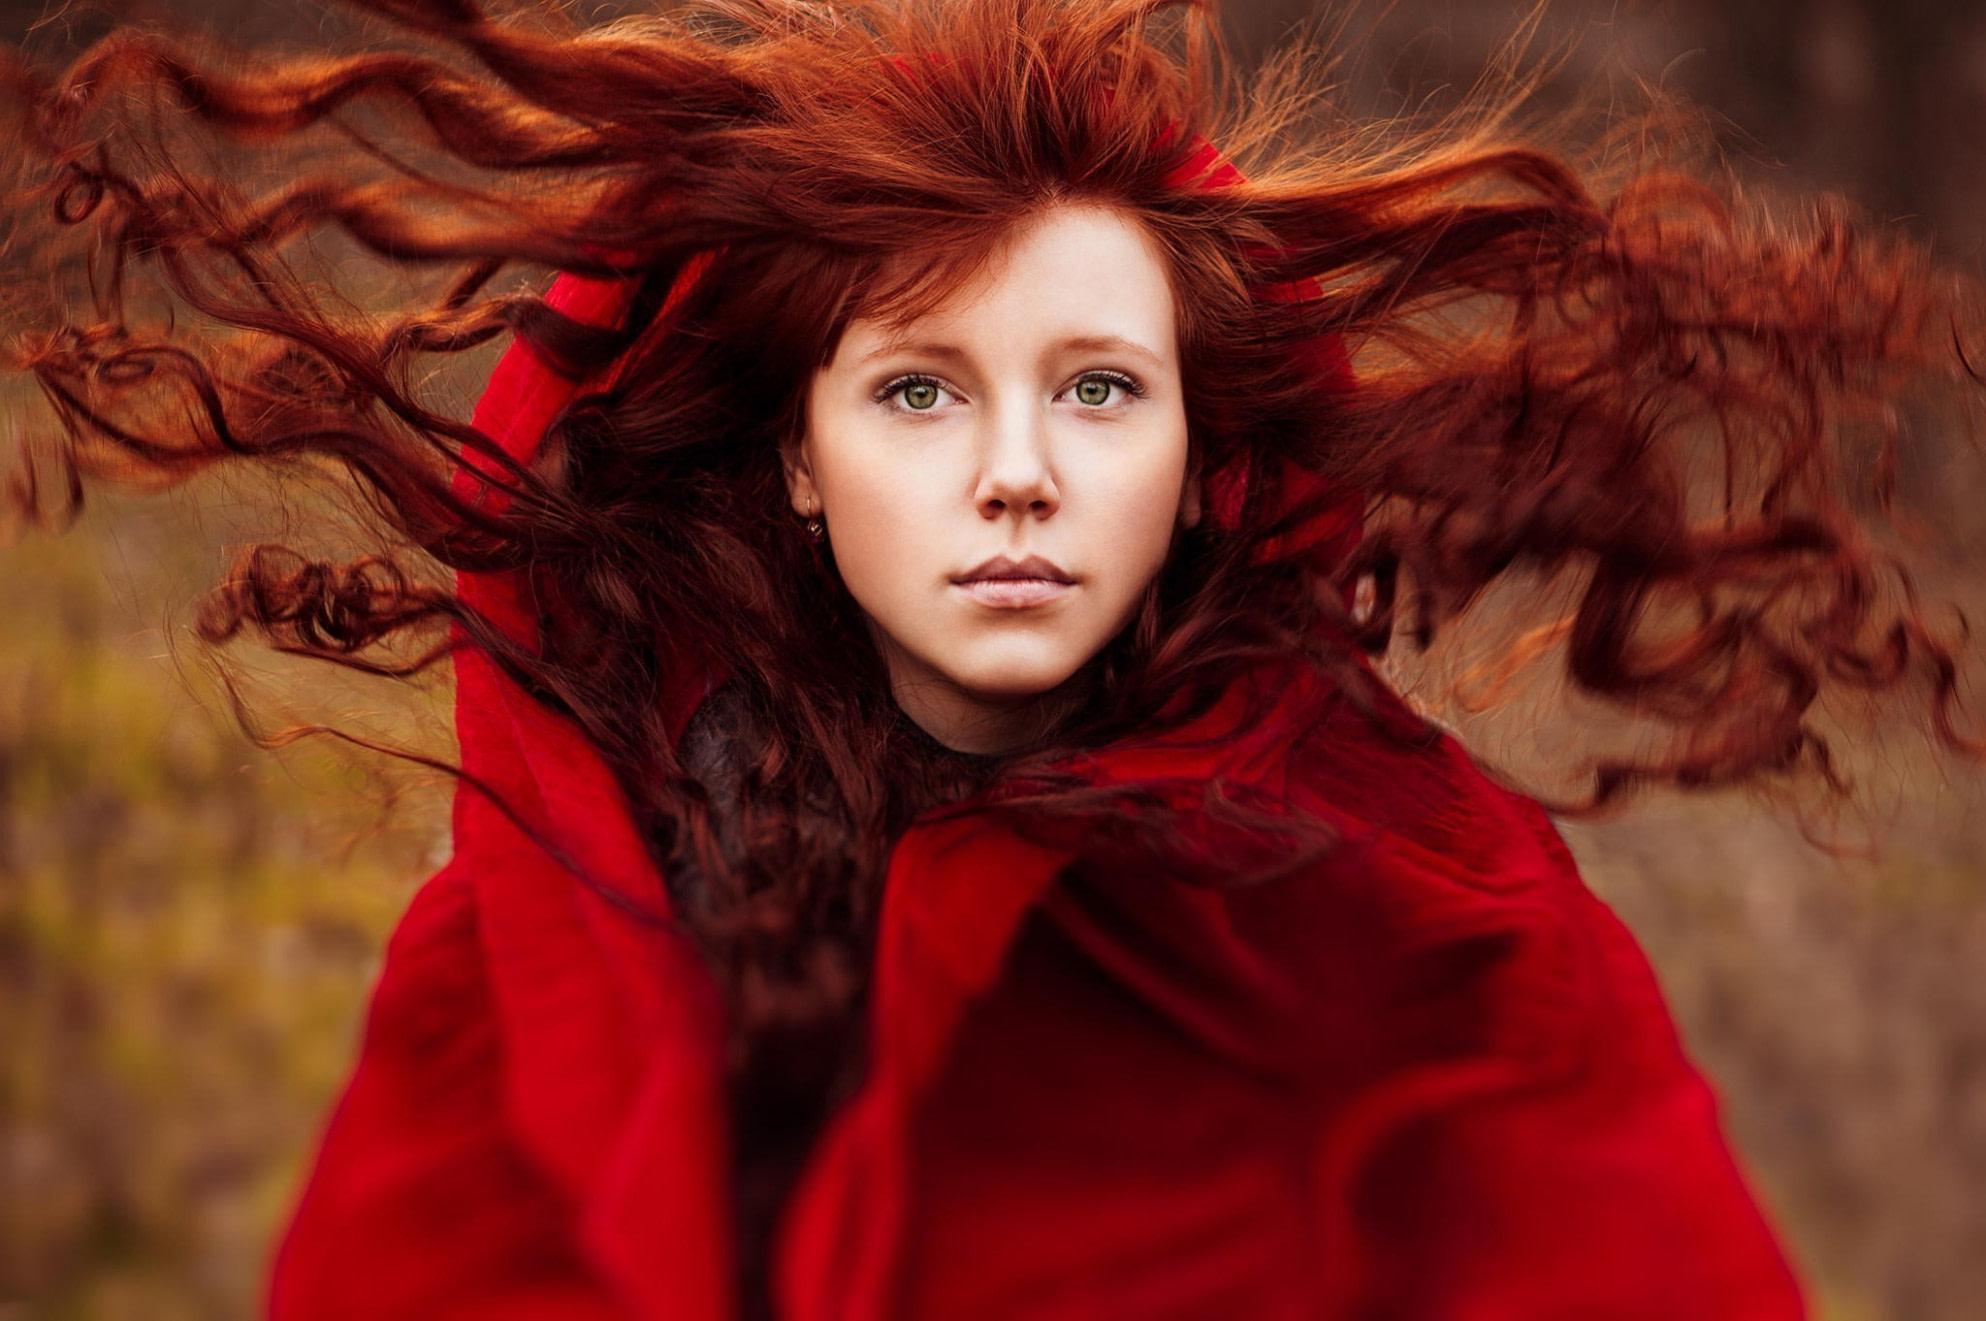 Naturrote Haare: 14 Dinge, Die Nur Rothaarige Personen Betreffen! - Rothaarige Männer Frisuren